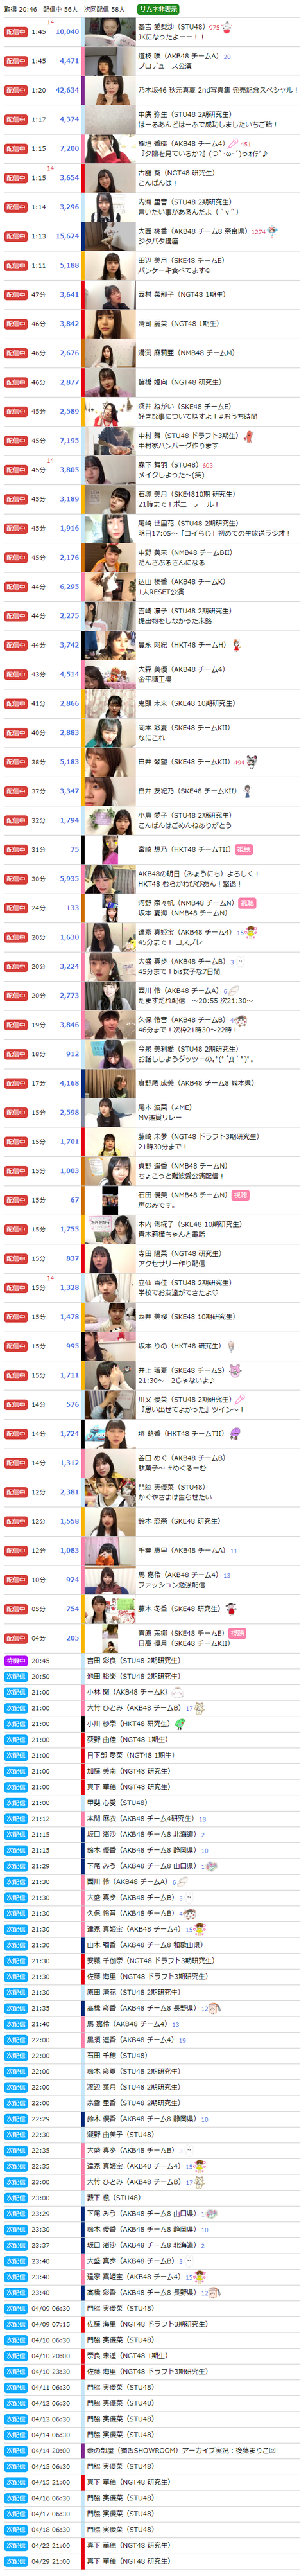 【SHOWROOM】AKB48Gのメンバー配信しすぎwwwwww